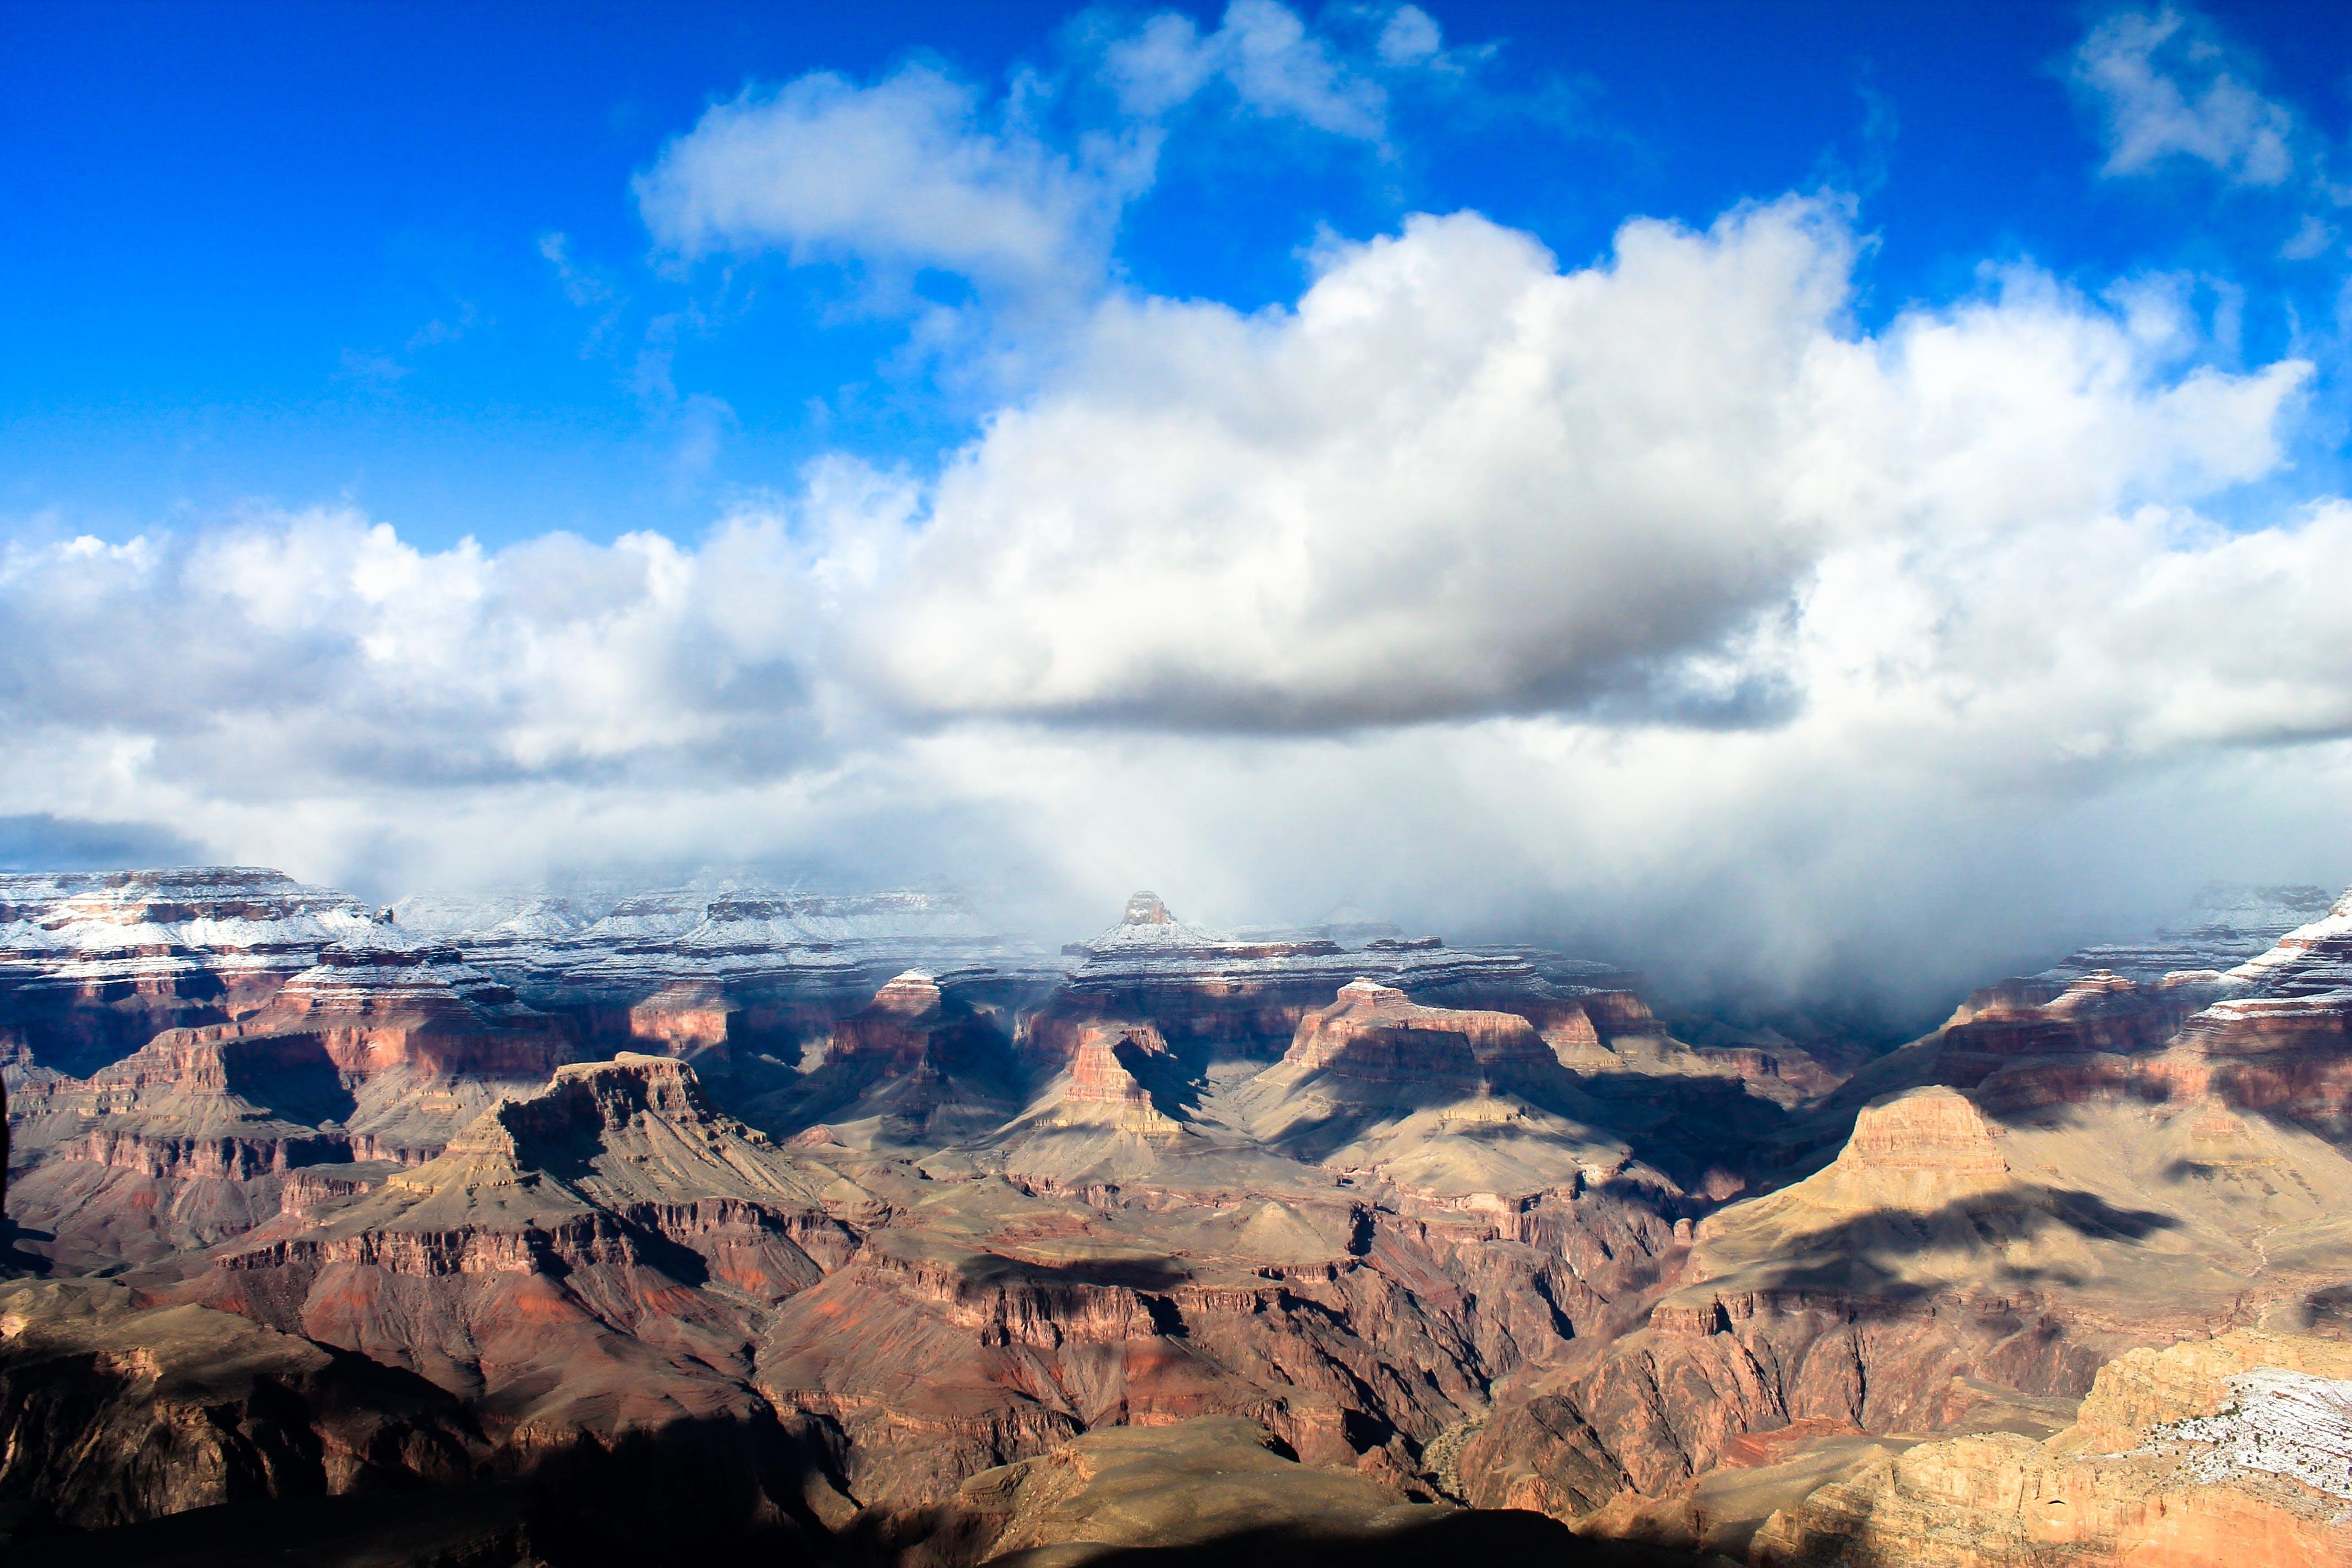 Kostenloses Stock Foto zu amerika, arizona, berg, bildung